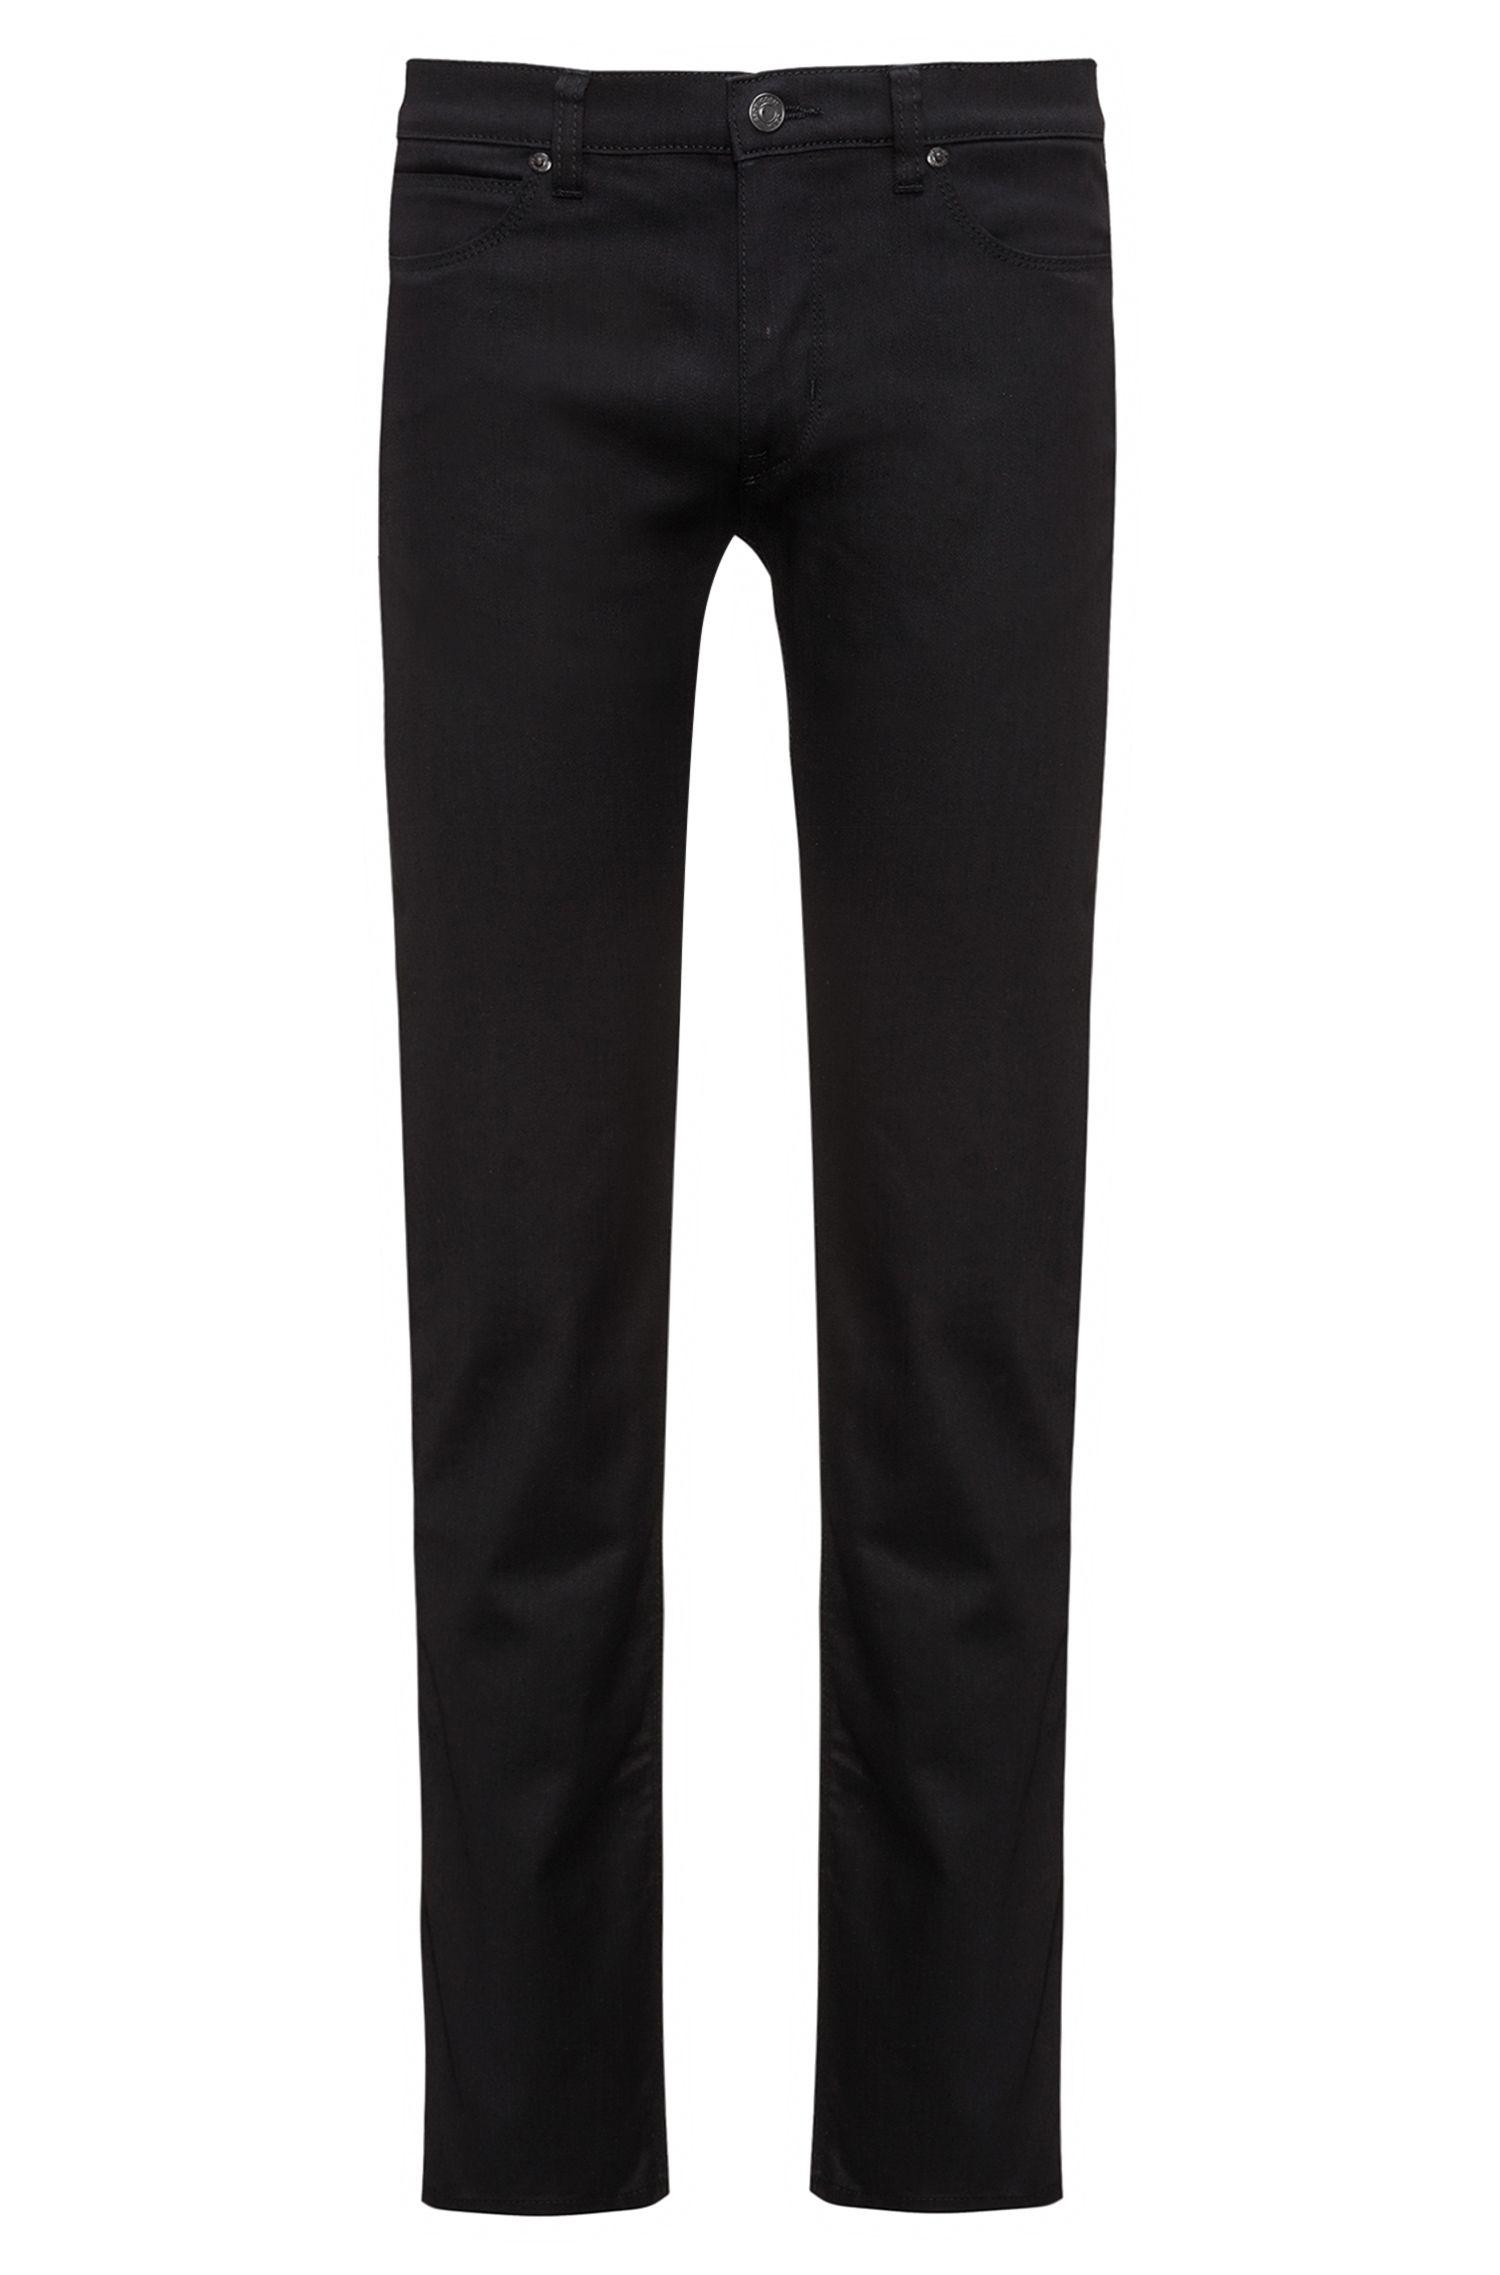 HUGO BOSS Jean Slim Fit en coton stretch